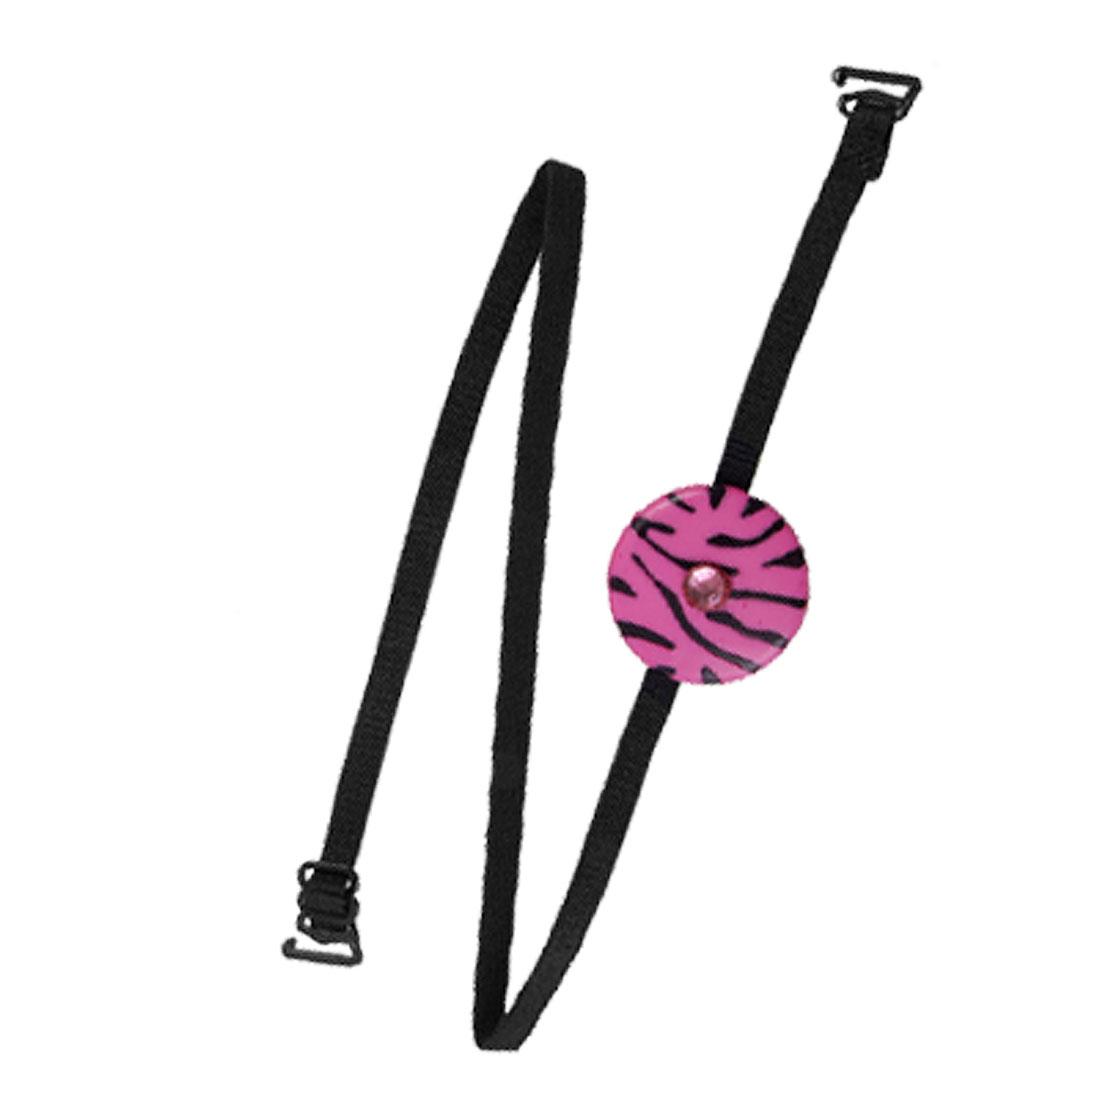 Adjustable Fuchsia Zebra Button Crystal Halter Bra Strap